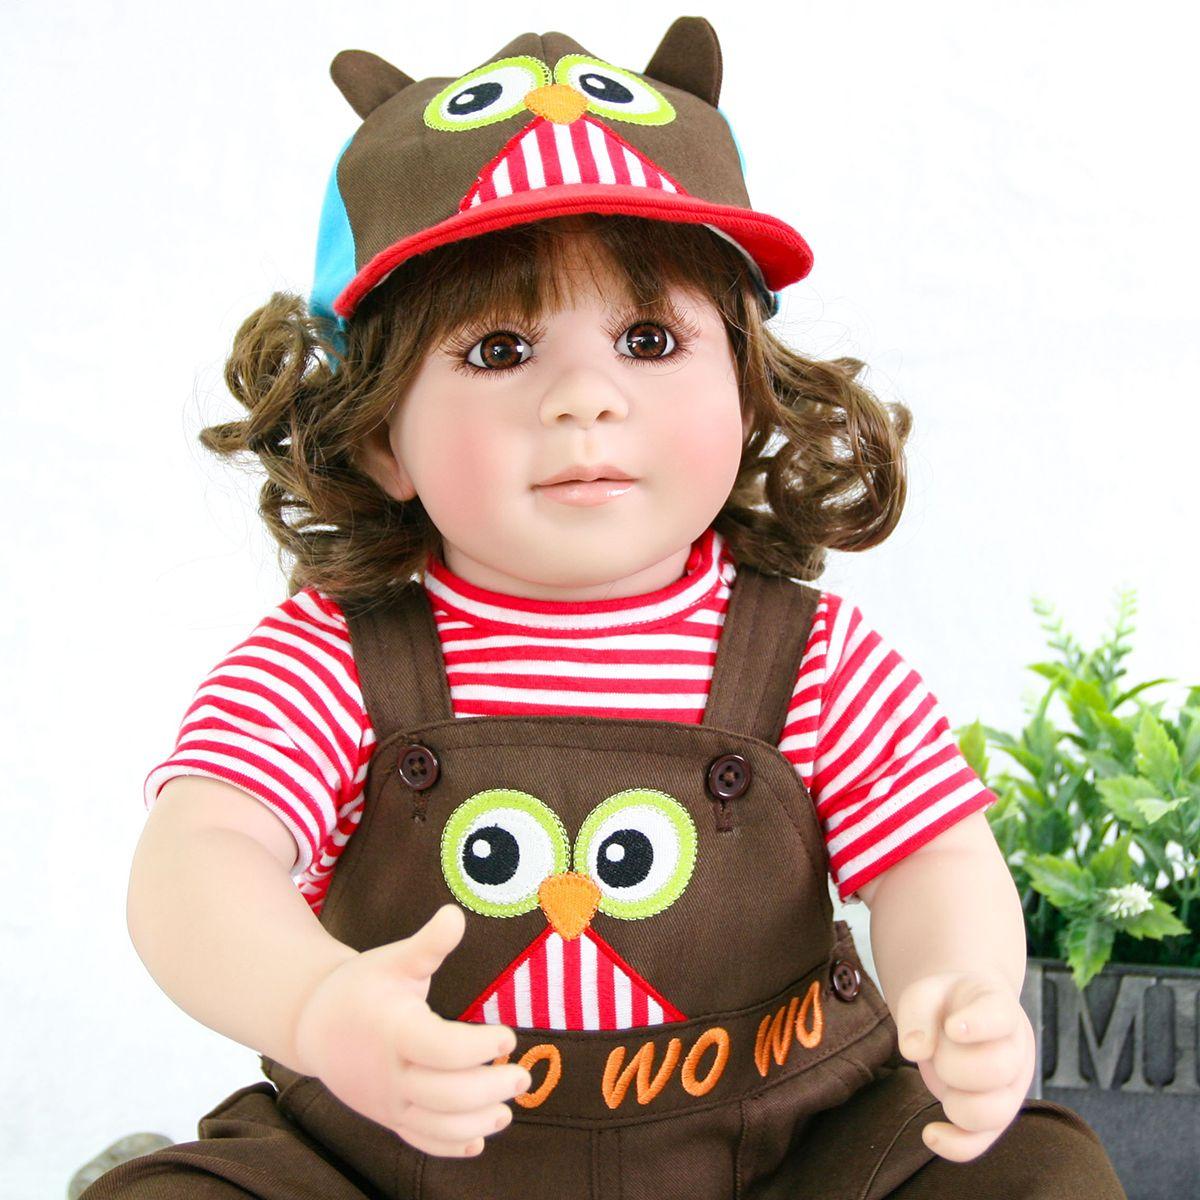 Reborn Toddler Baby Dolls 24/'/' Soft Vinyl Silicone Long Hair Doll Kids Xmas Gift